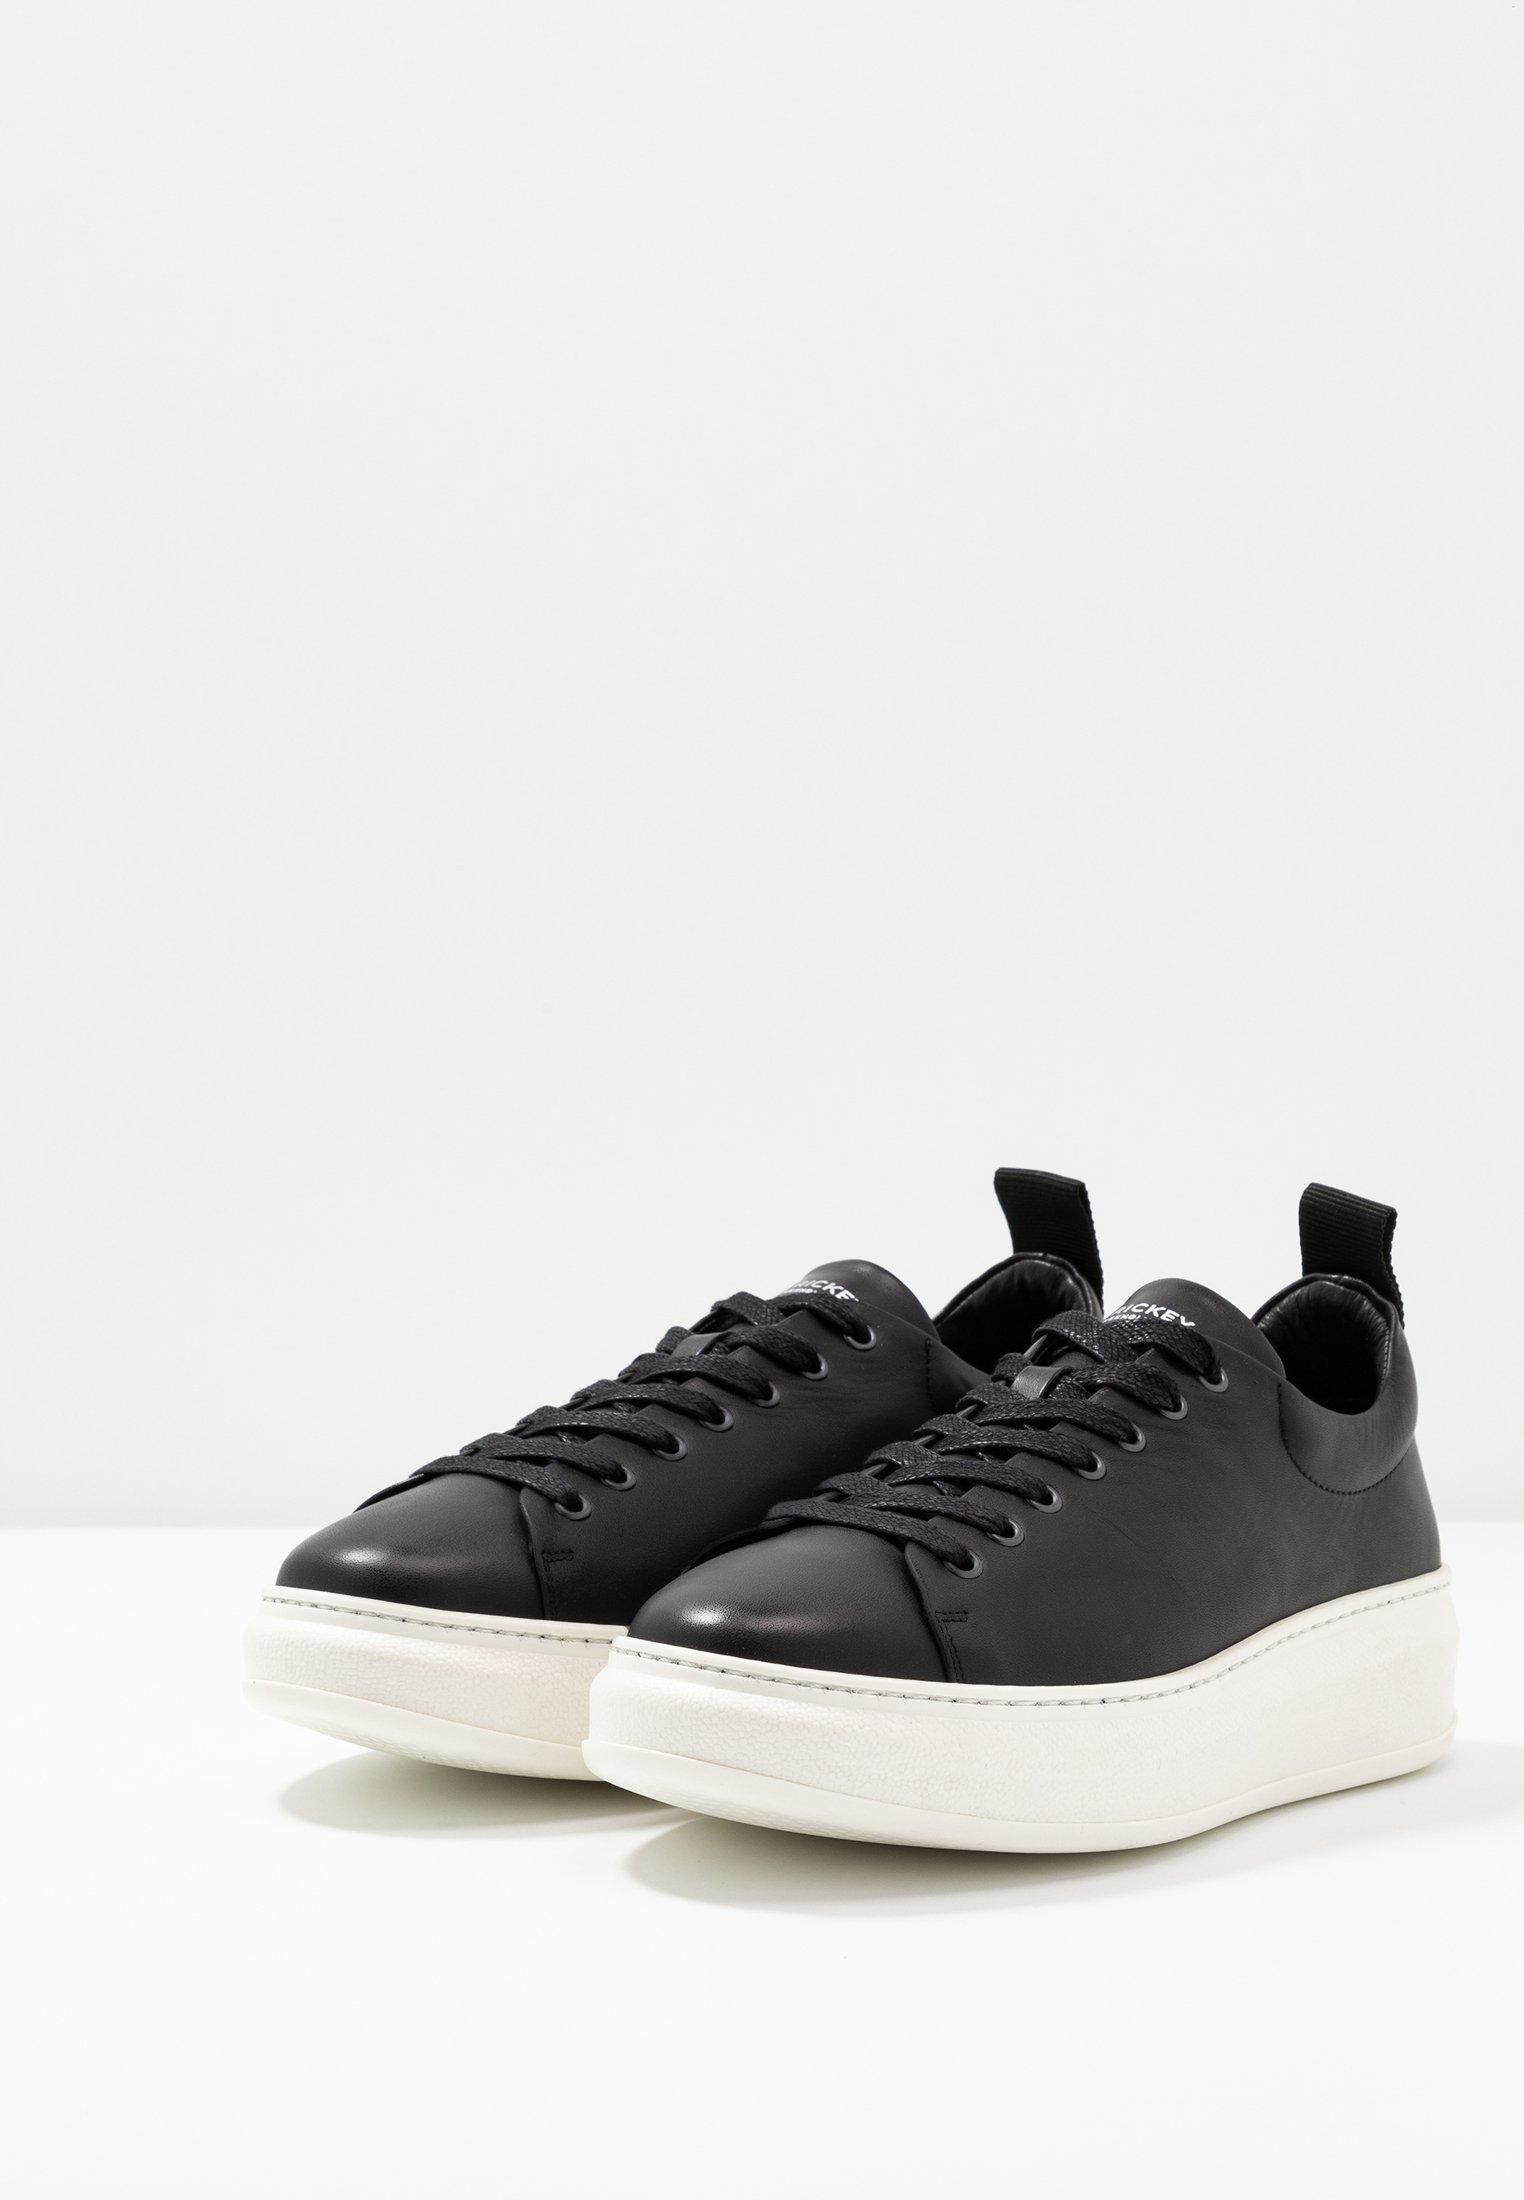 Jim Club TechSneakers Basse Rickey Black 6fYb7gIvy